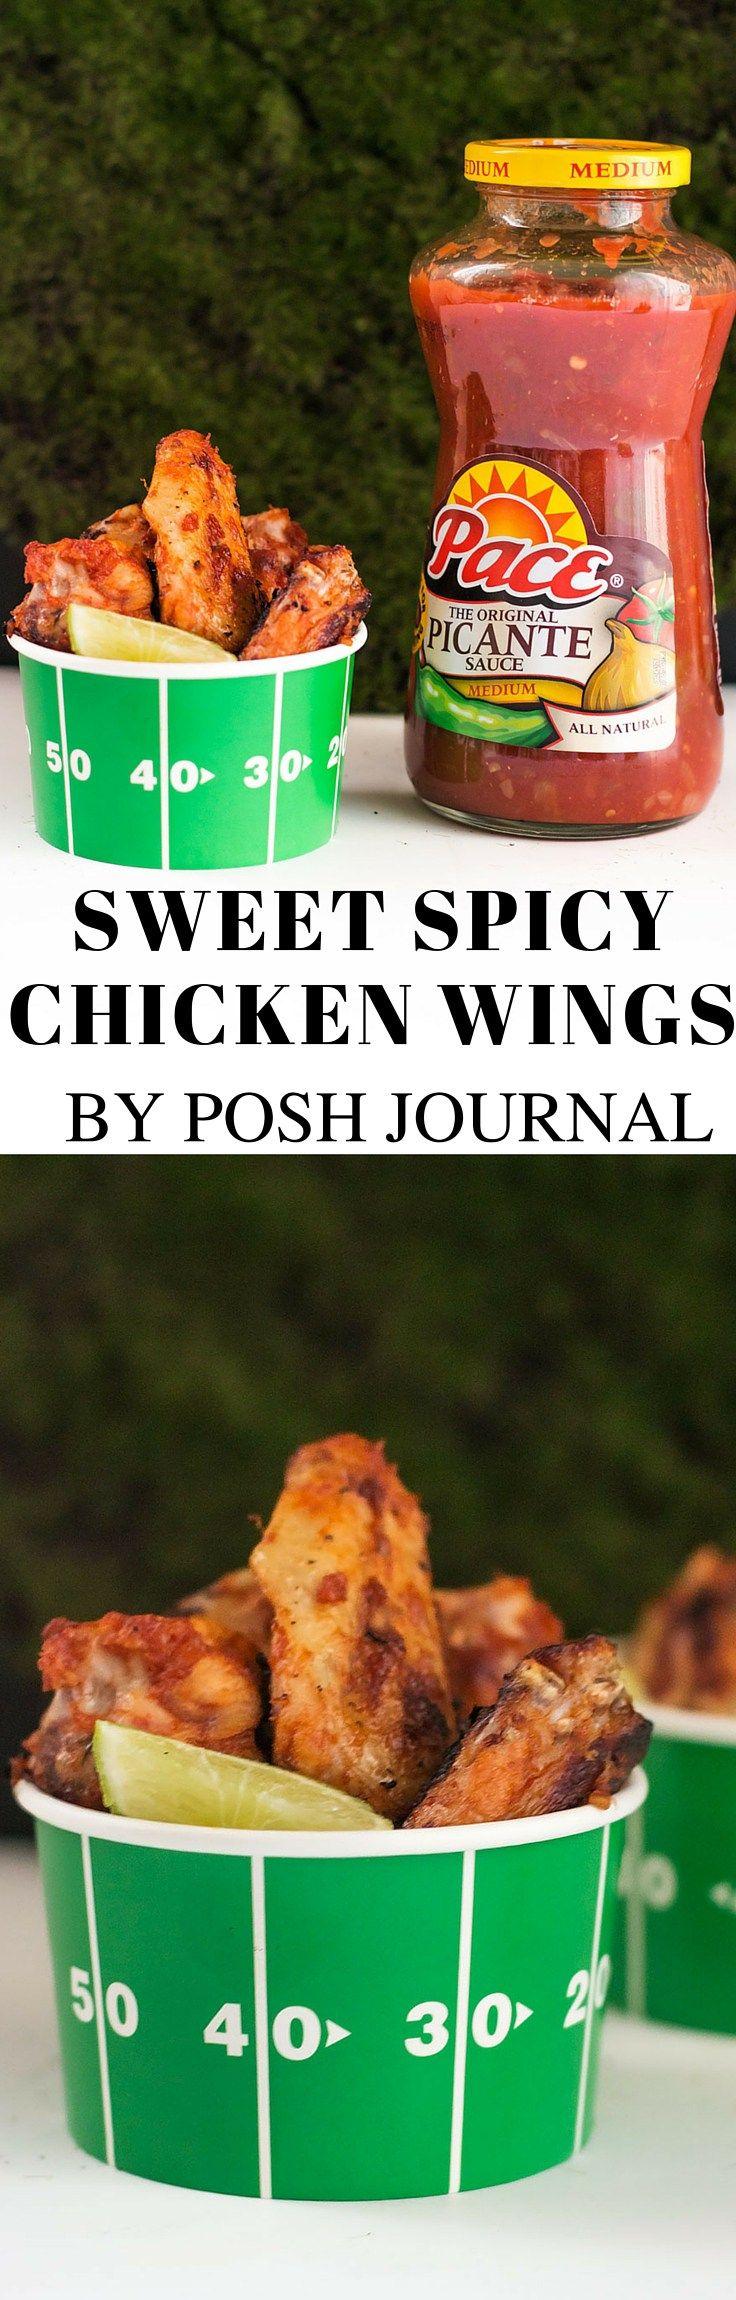 Sweet Spicy Chicken Wings - Best Gameday Food